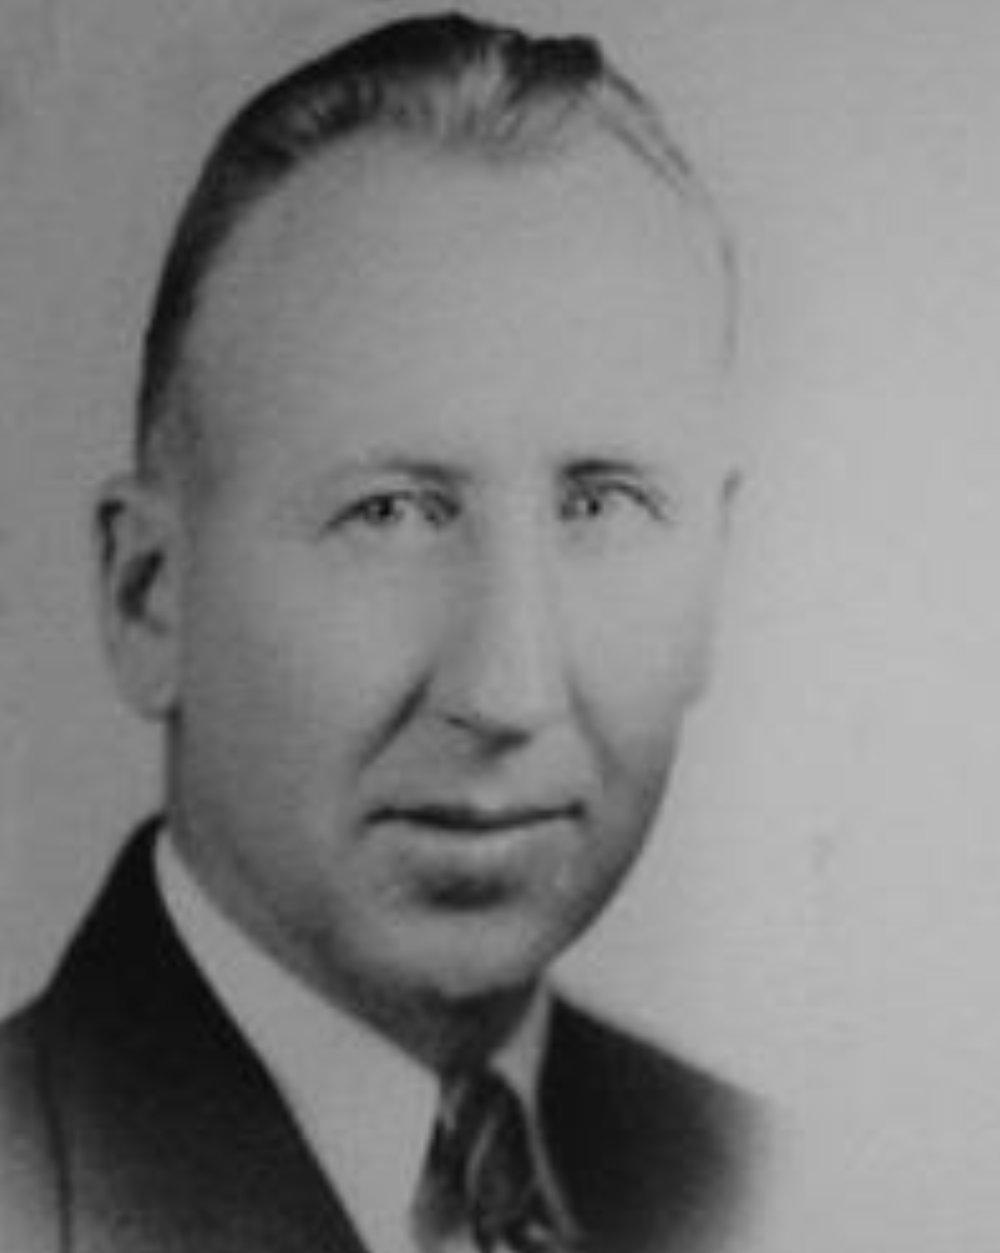 J. FLETCHER MARSHALL